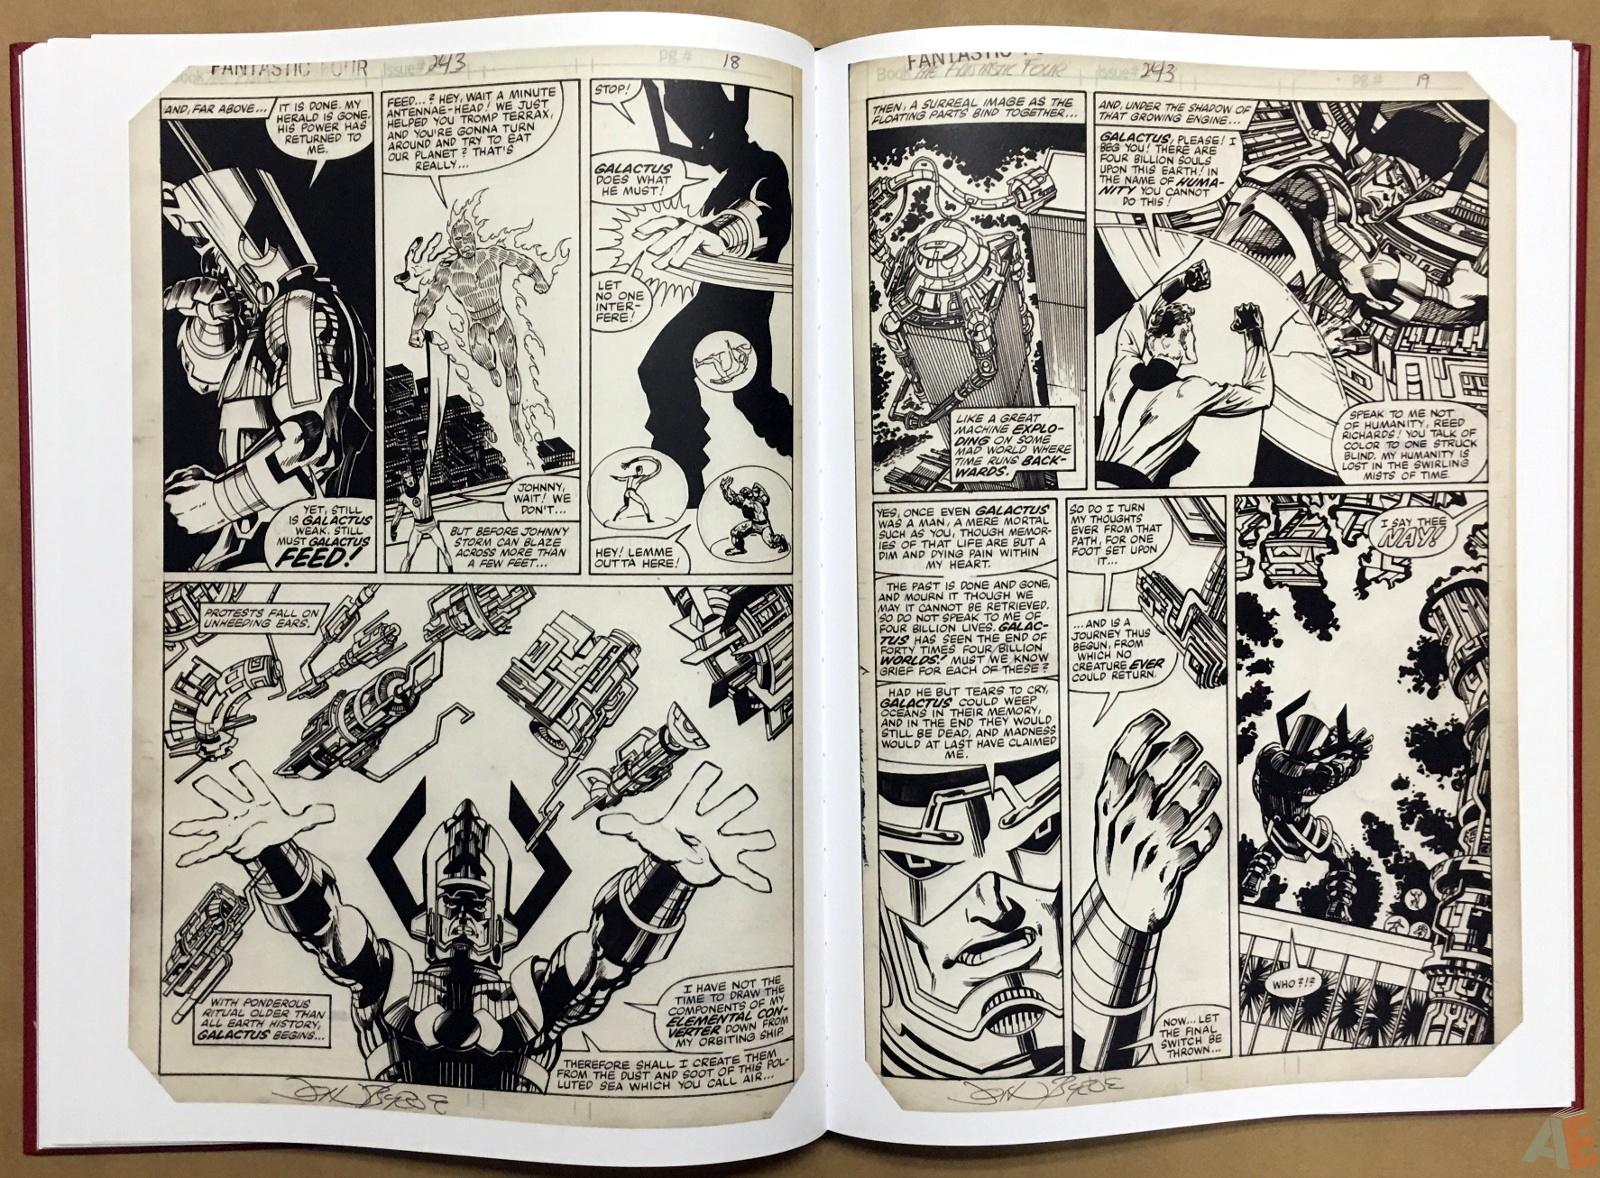 John Byrne's The Fantastic Four Artist's Edition 28